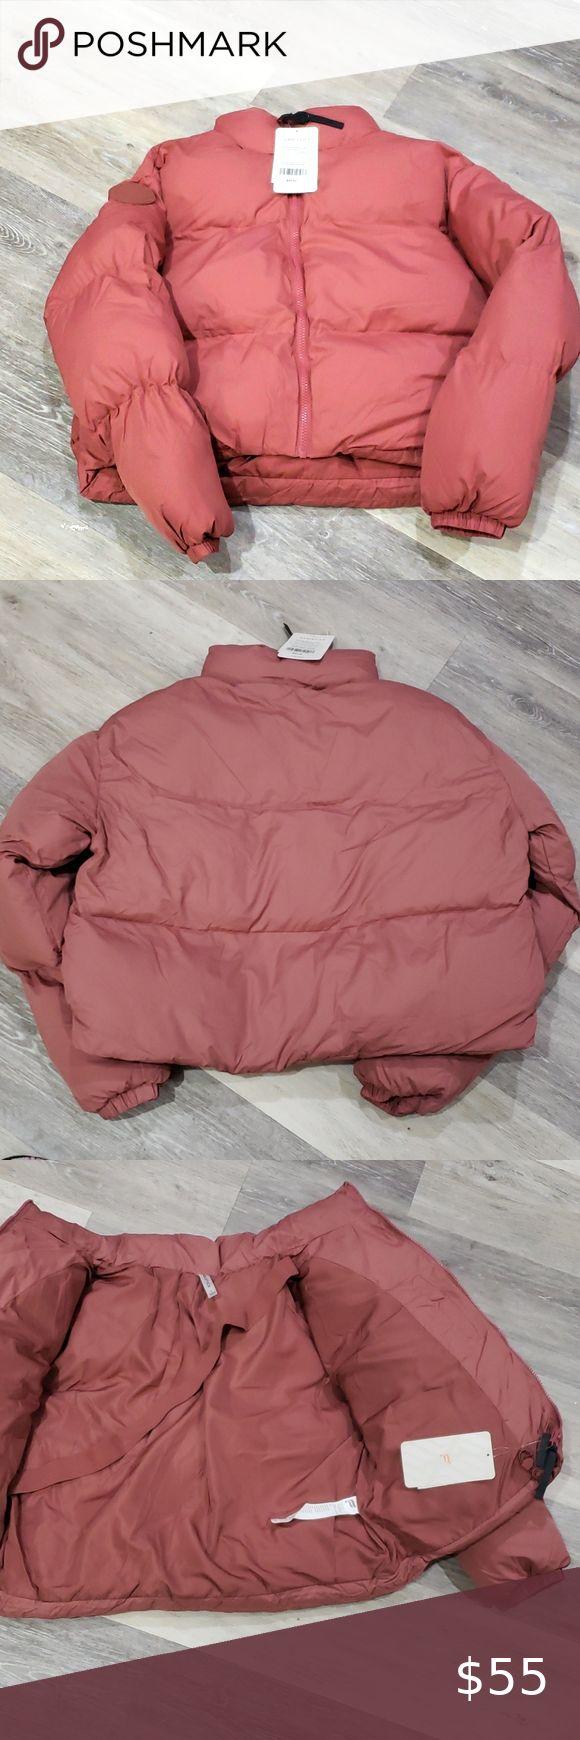 Wander Cropped Puffer Jacket Size Small 6 Cropped Puffer Jacket Jacket Brands Jackets [ 1740 x 580 Pixel ]